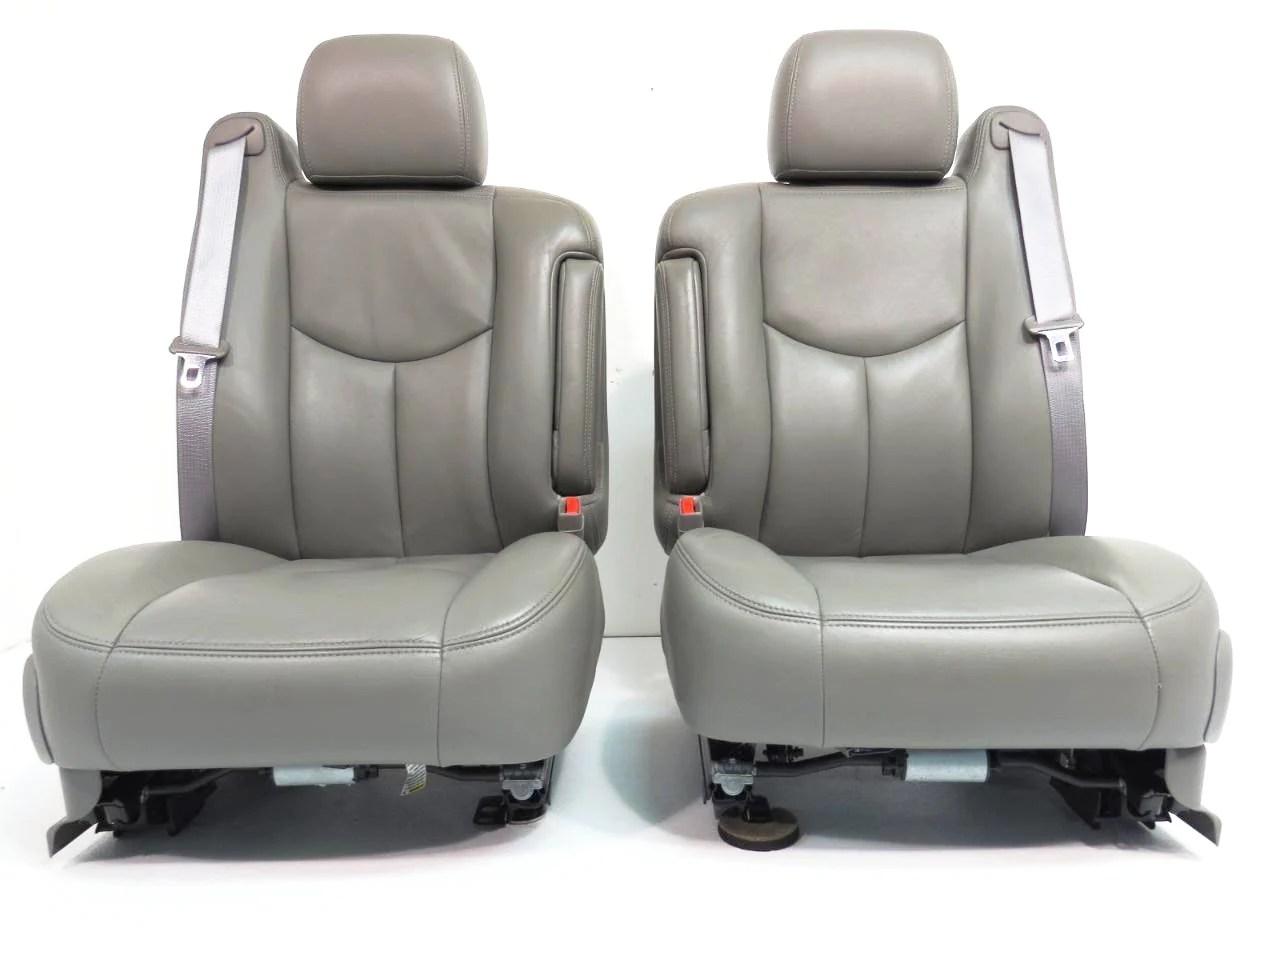 chevy gmc silverado sierra tahoe yukon suburban oem leather seats pewter grey 2000 2001 2002 2003  [ 1280 x 960 Pixel ]